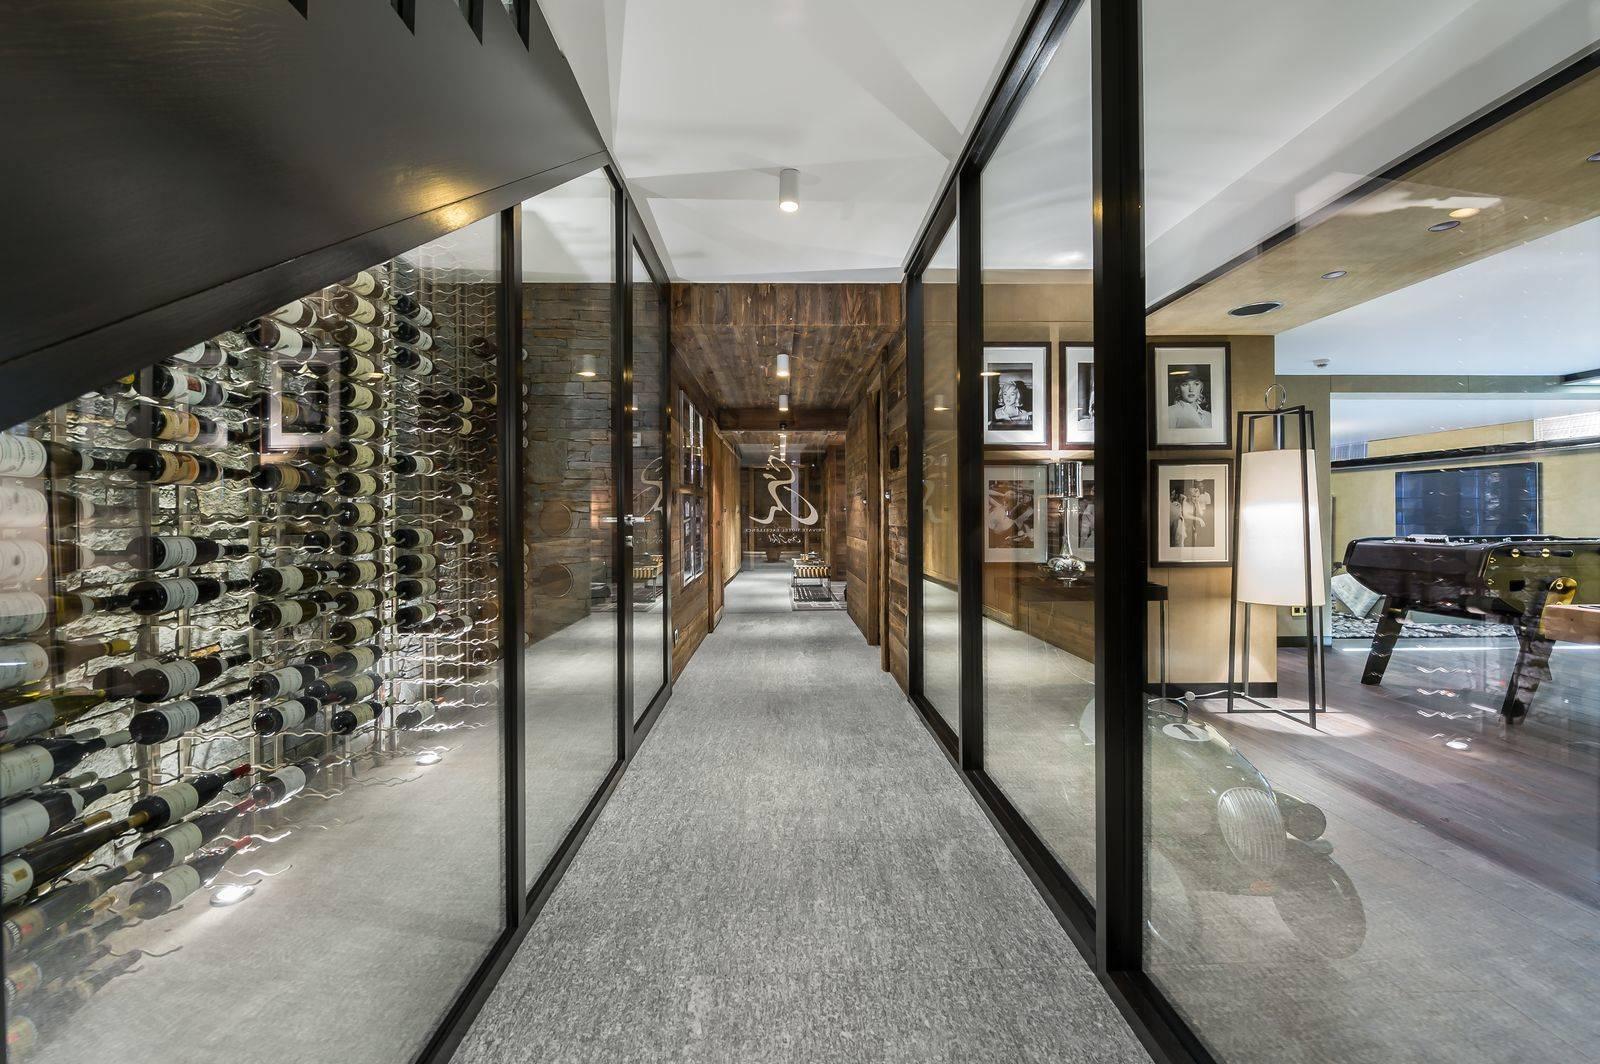 Lovelydays luxury service apartment rental - Megève - Senses Chalet - Partner - 6 bedrooms - 6 bathrooms - Double living room - e8c86119526c - Lovelydays